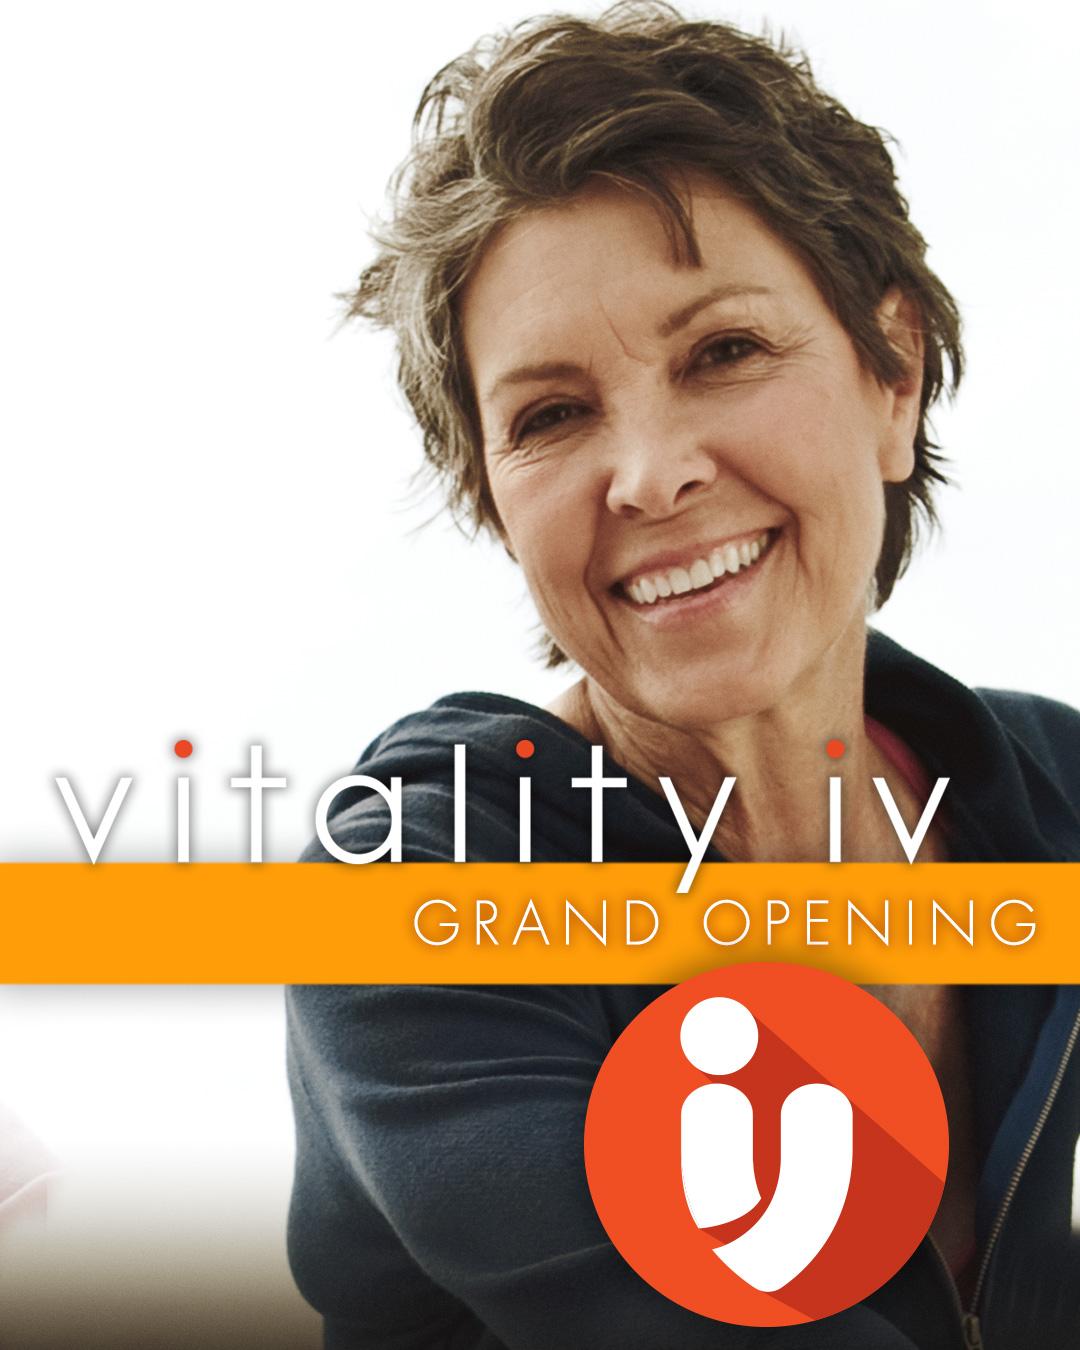 Vitality_IV_Grand_Opening-3.jpg